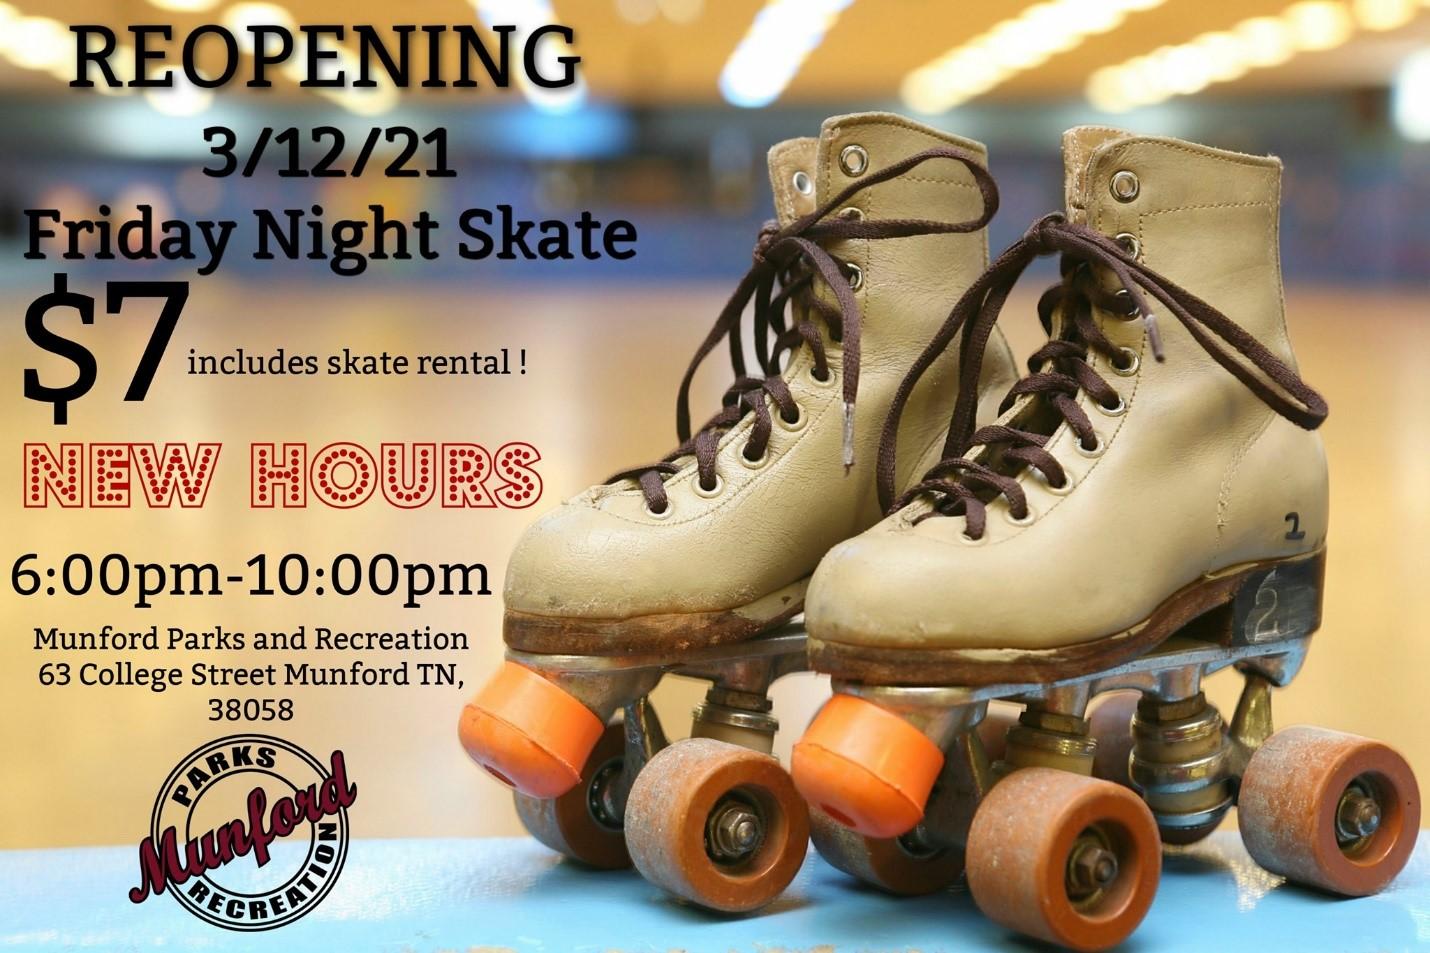 Re-opening skating rink